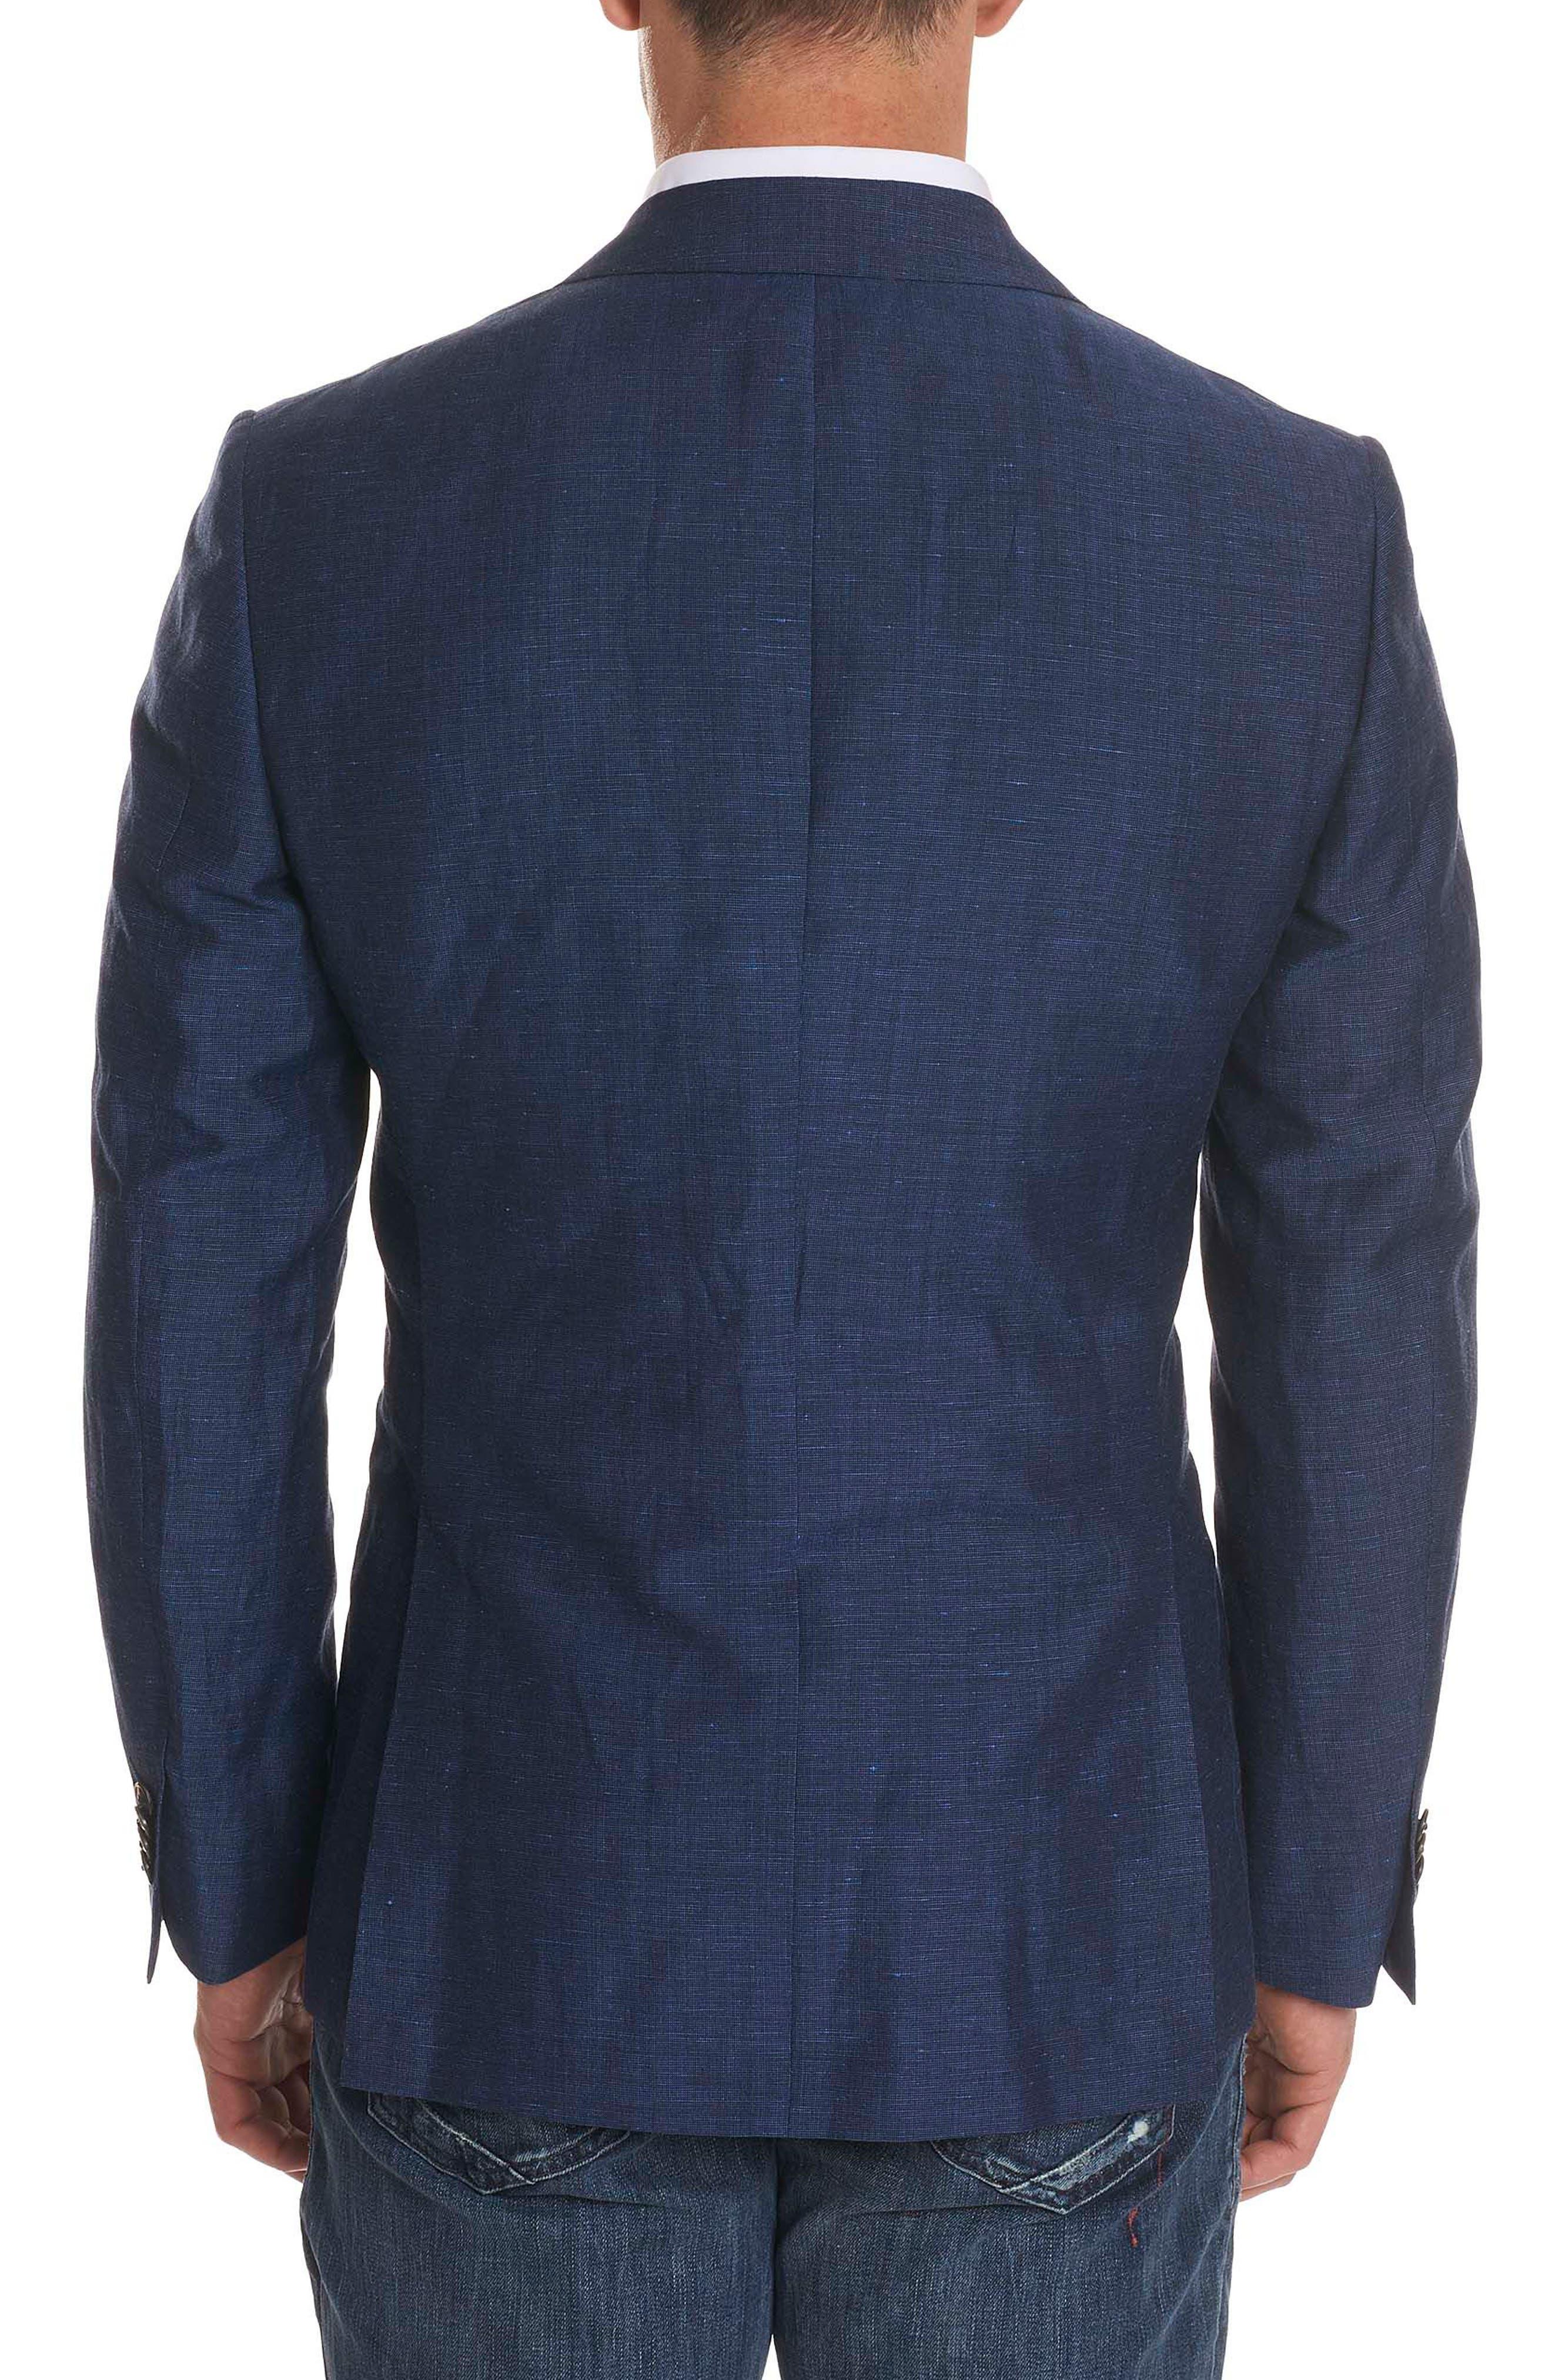 Alternate Image 2  - Robert Graham Vidin Tailored Fit Linen & Wool Sportcoat